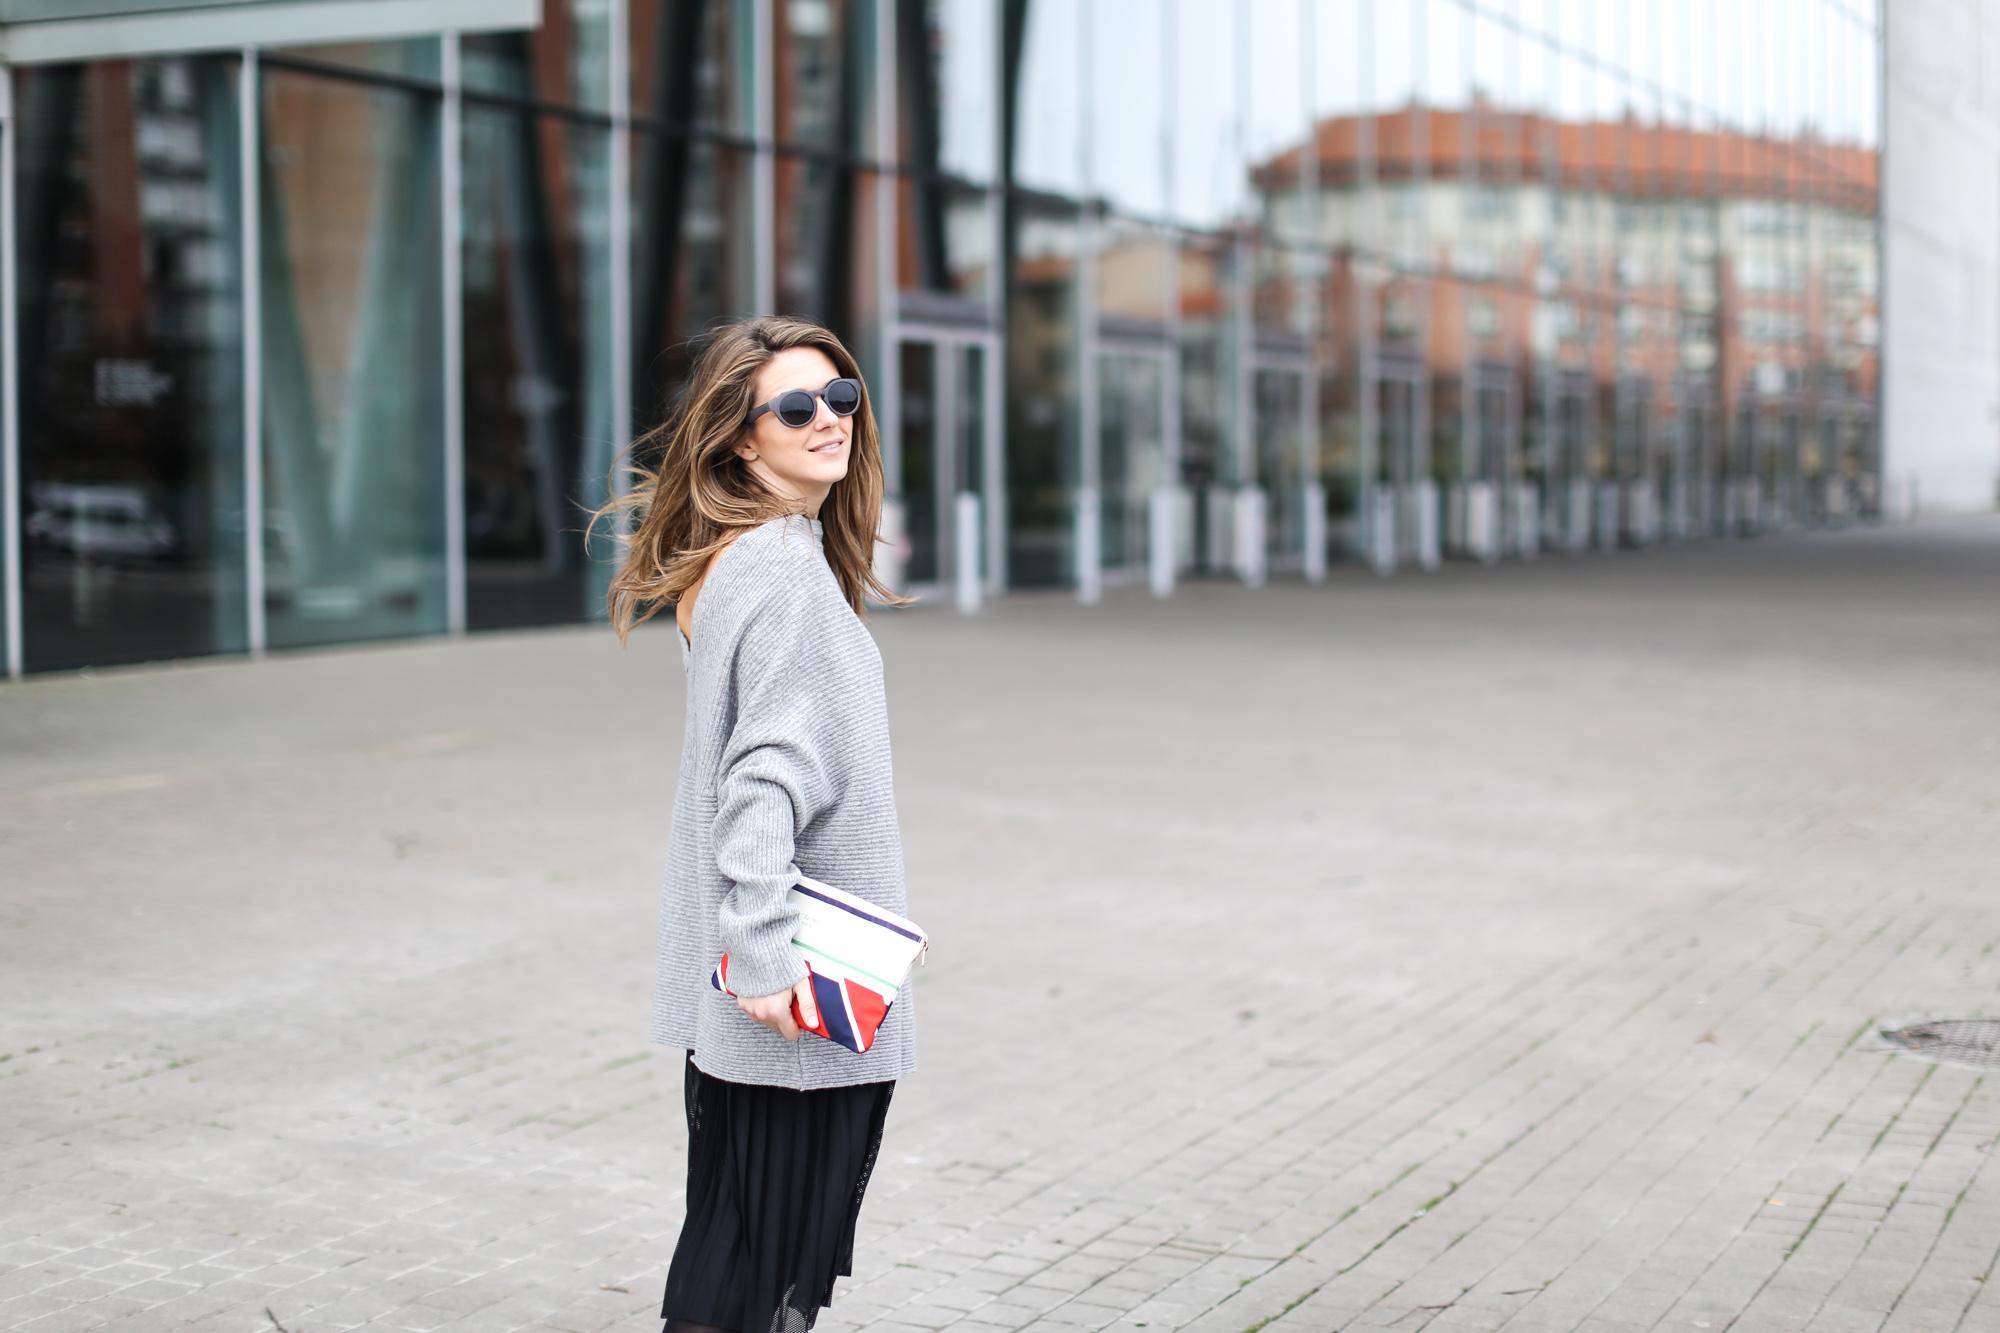 Clochet-streetstyle-zara-oversized-grey-knit-adidas-gazelle-suiteblanco-falda-plisada-celine-paris-clutch-11